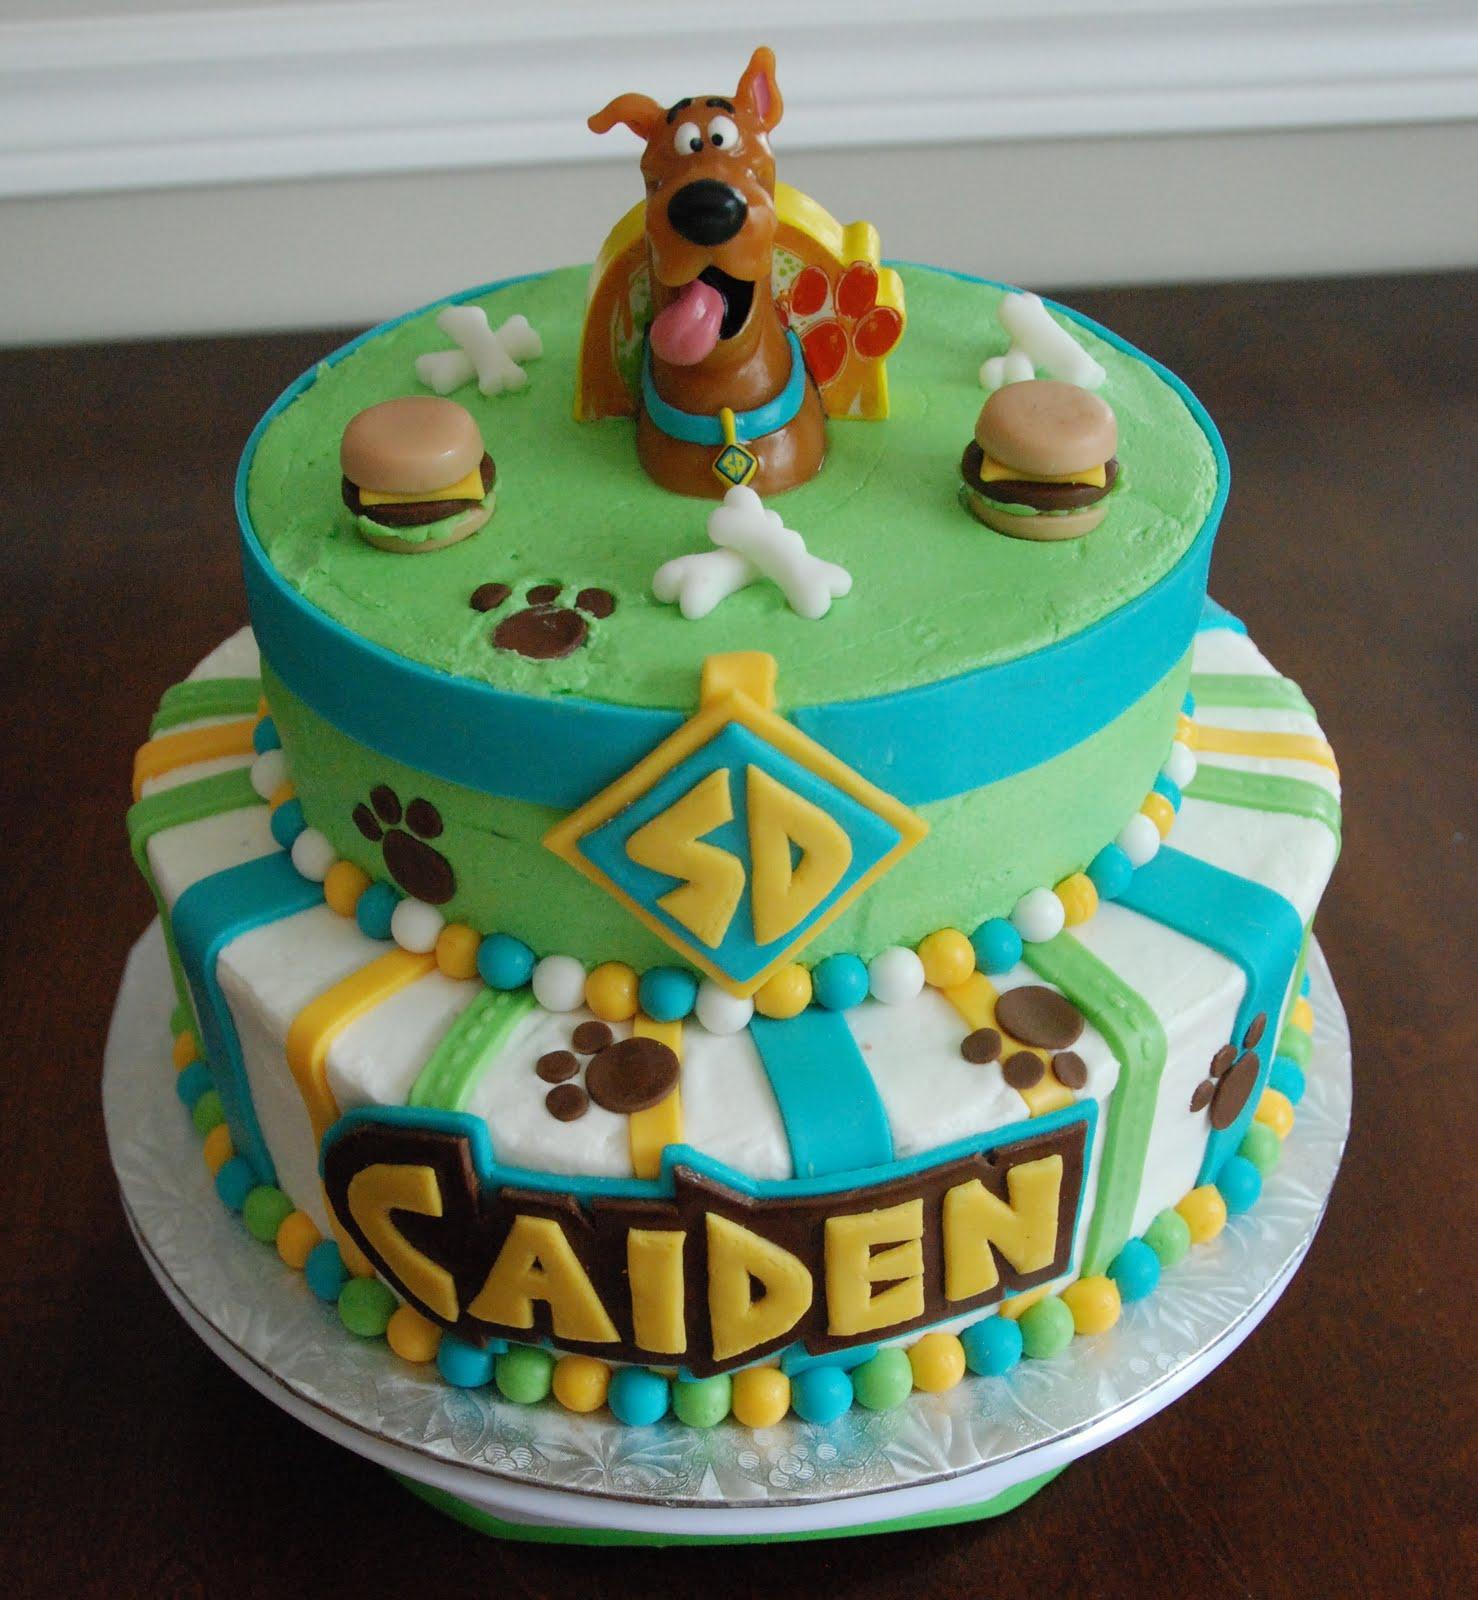 Pleasing Scooby Doo Cakes Decoration Ideas Little Birthday Cakes Funny Birthday Cards Online Elaedamsfinfo